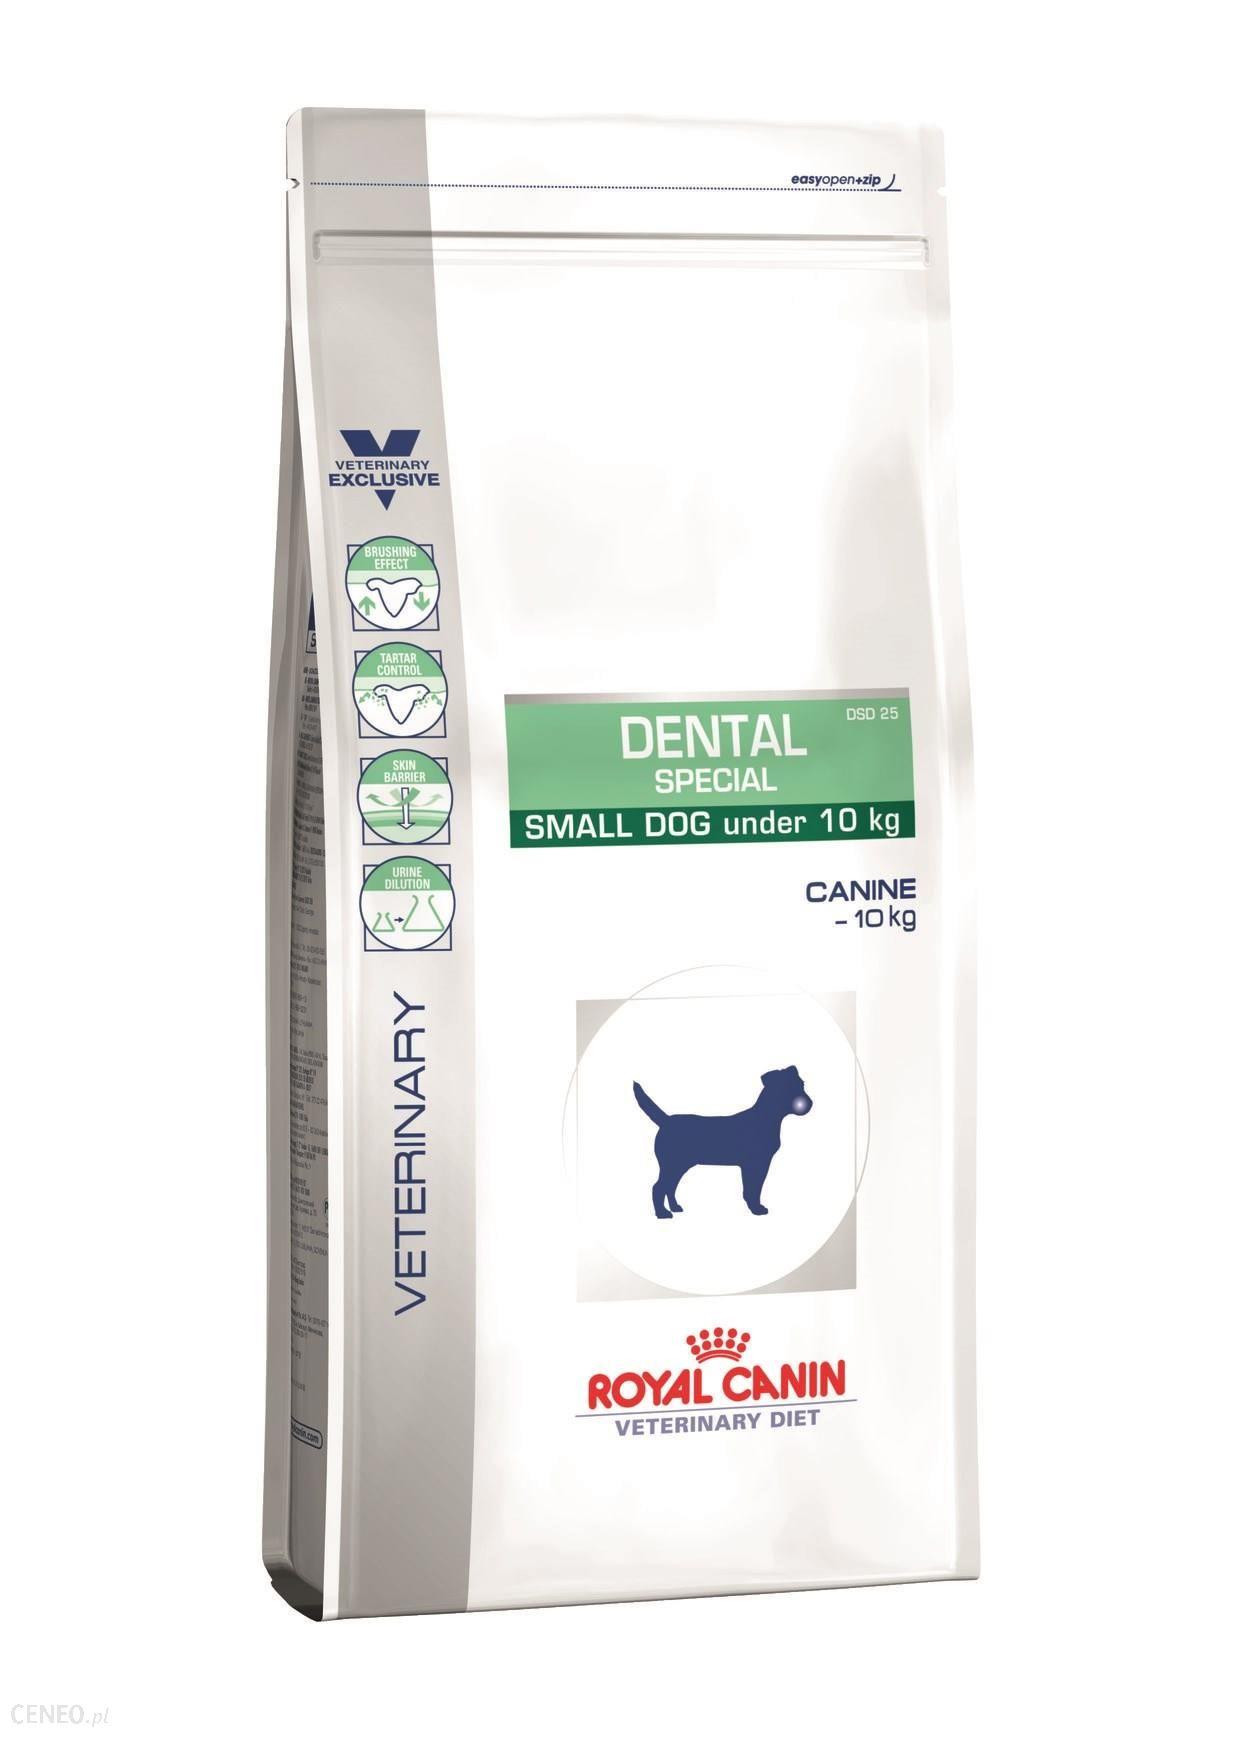 Royal Canin Veterinary Diet Dental Special Small Dog DSD25 2Kg